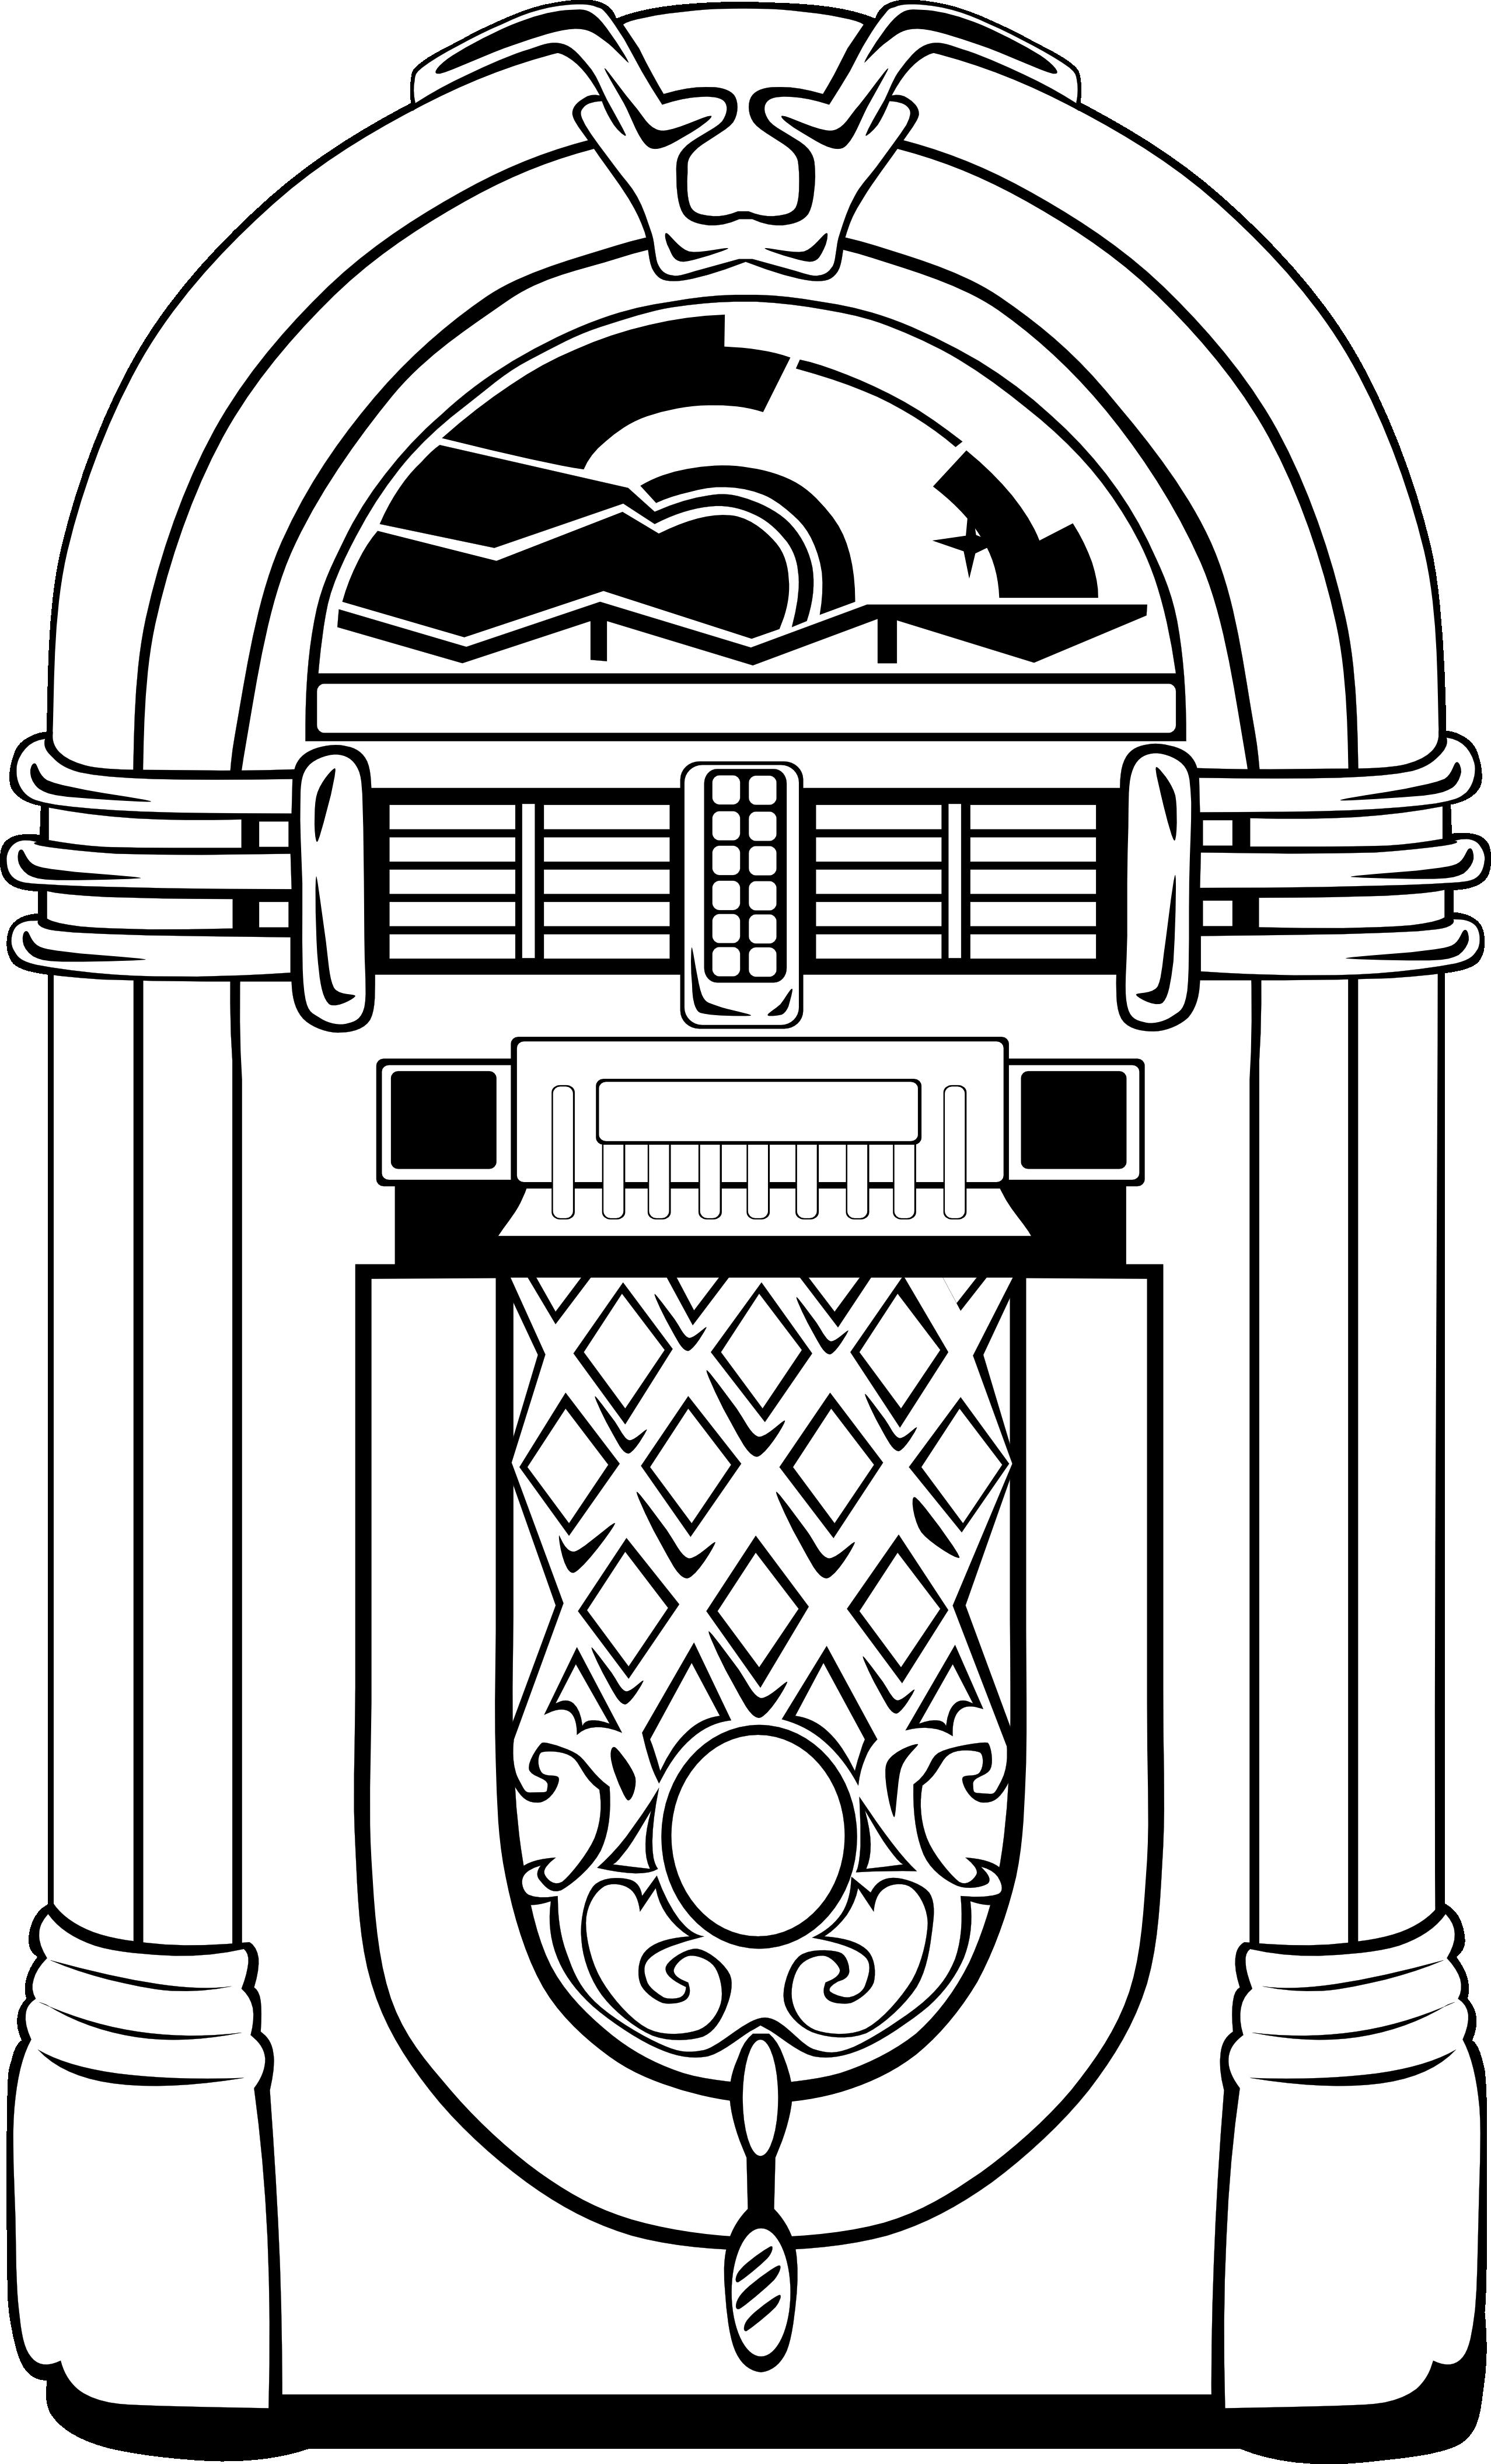 acq7Lb5ji png (2555×4221) Jukebox Coloring pages